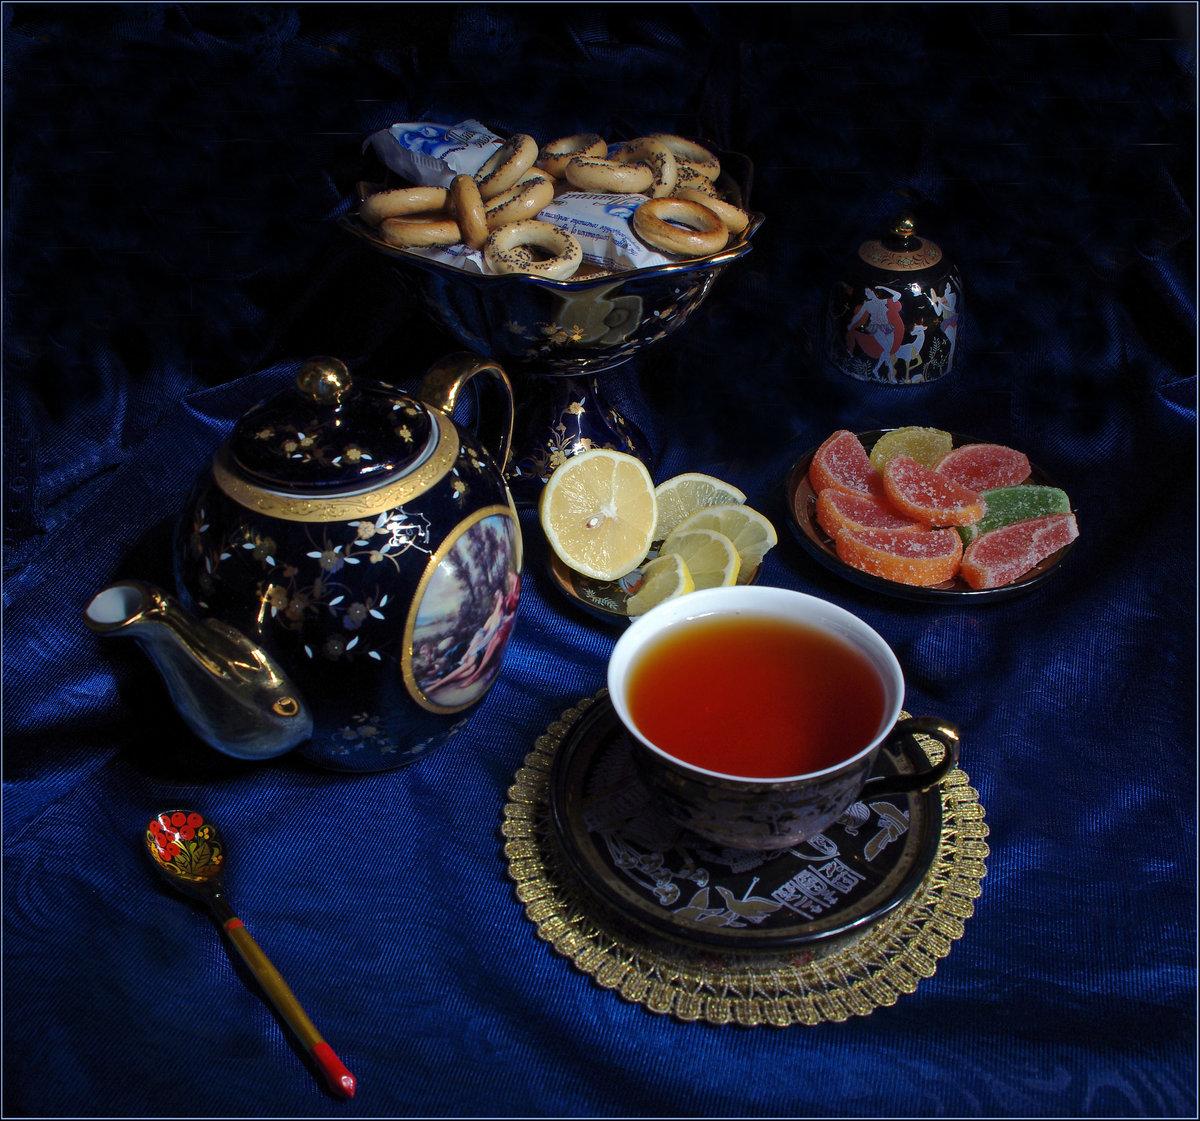 вечерний чай картинки доброго вечера увидим, как